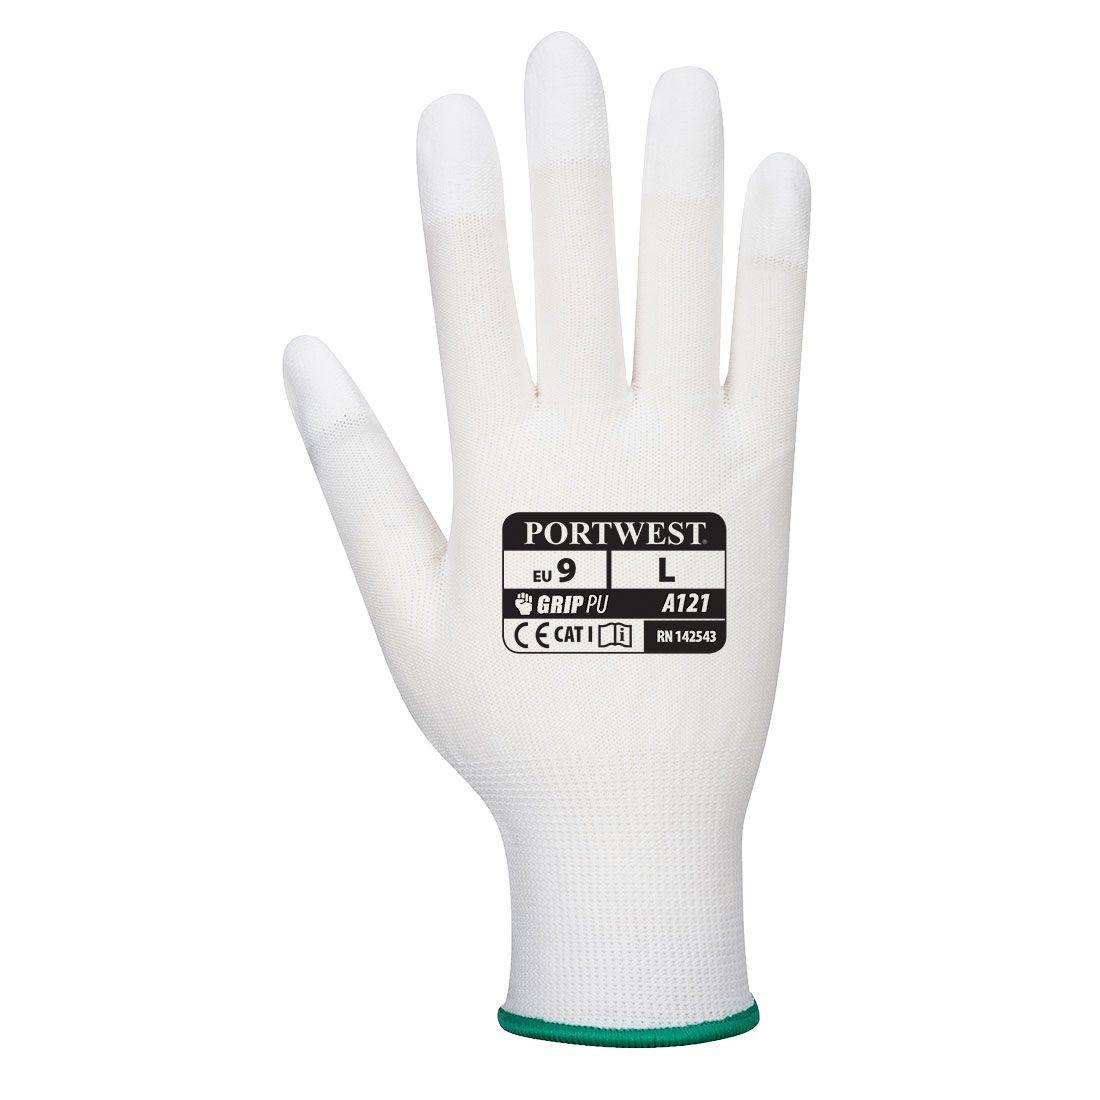 Portwest Handschoenen A121 wit(WH)